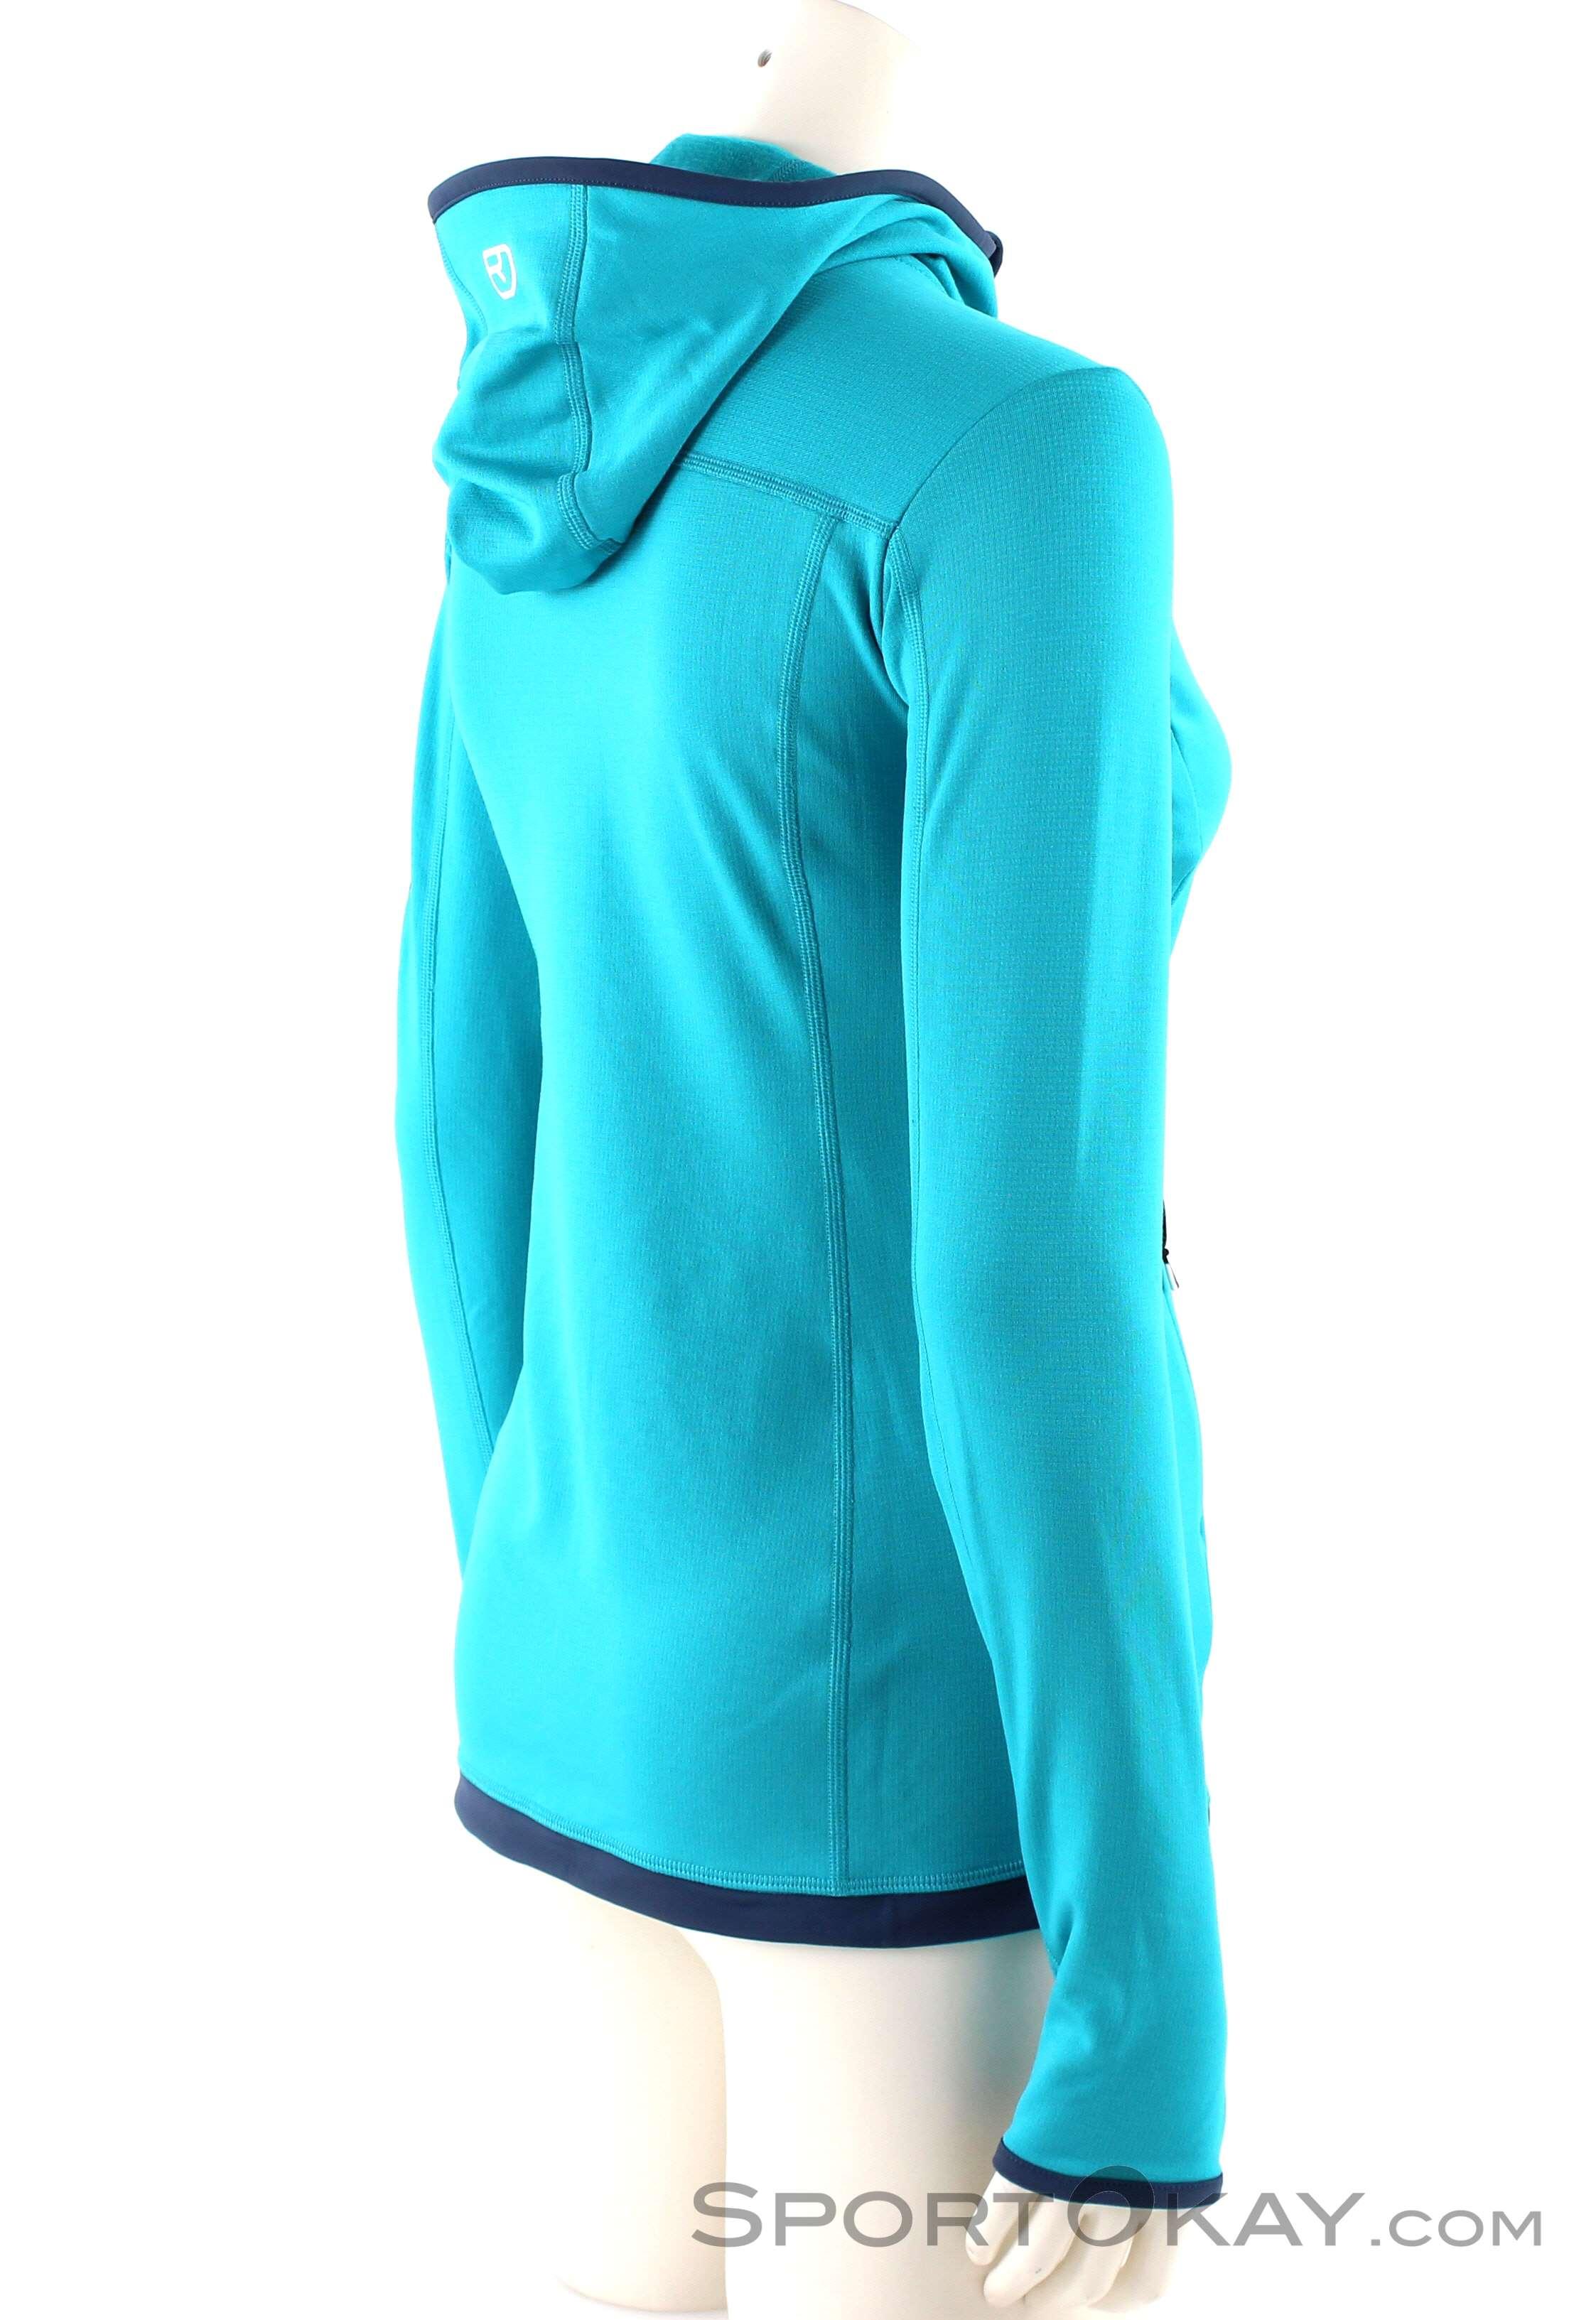 Ortovox Fleece Light Hoody Damen Outdoorsweater, Ortovox, Türkis, , Damen,  0016- 32dcf0d22f